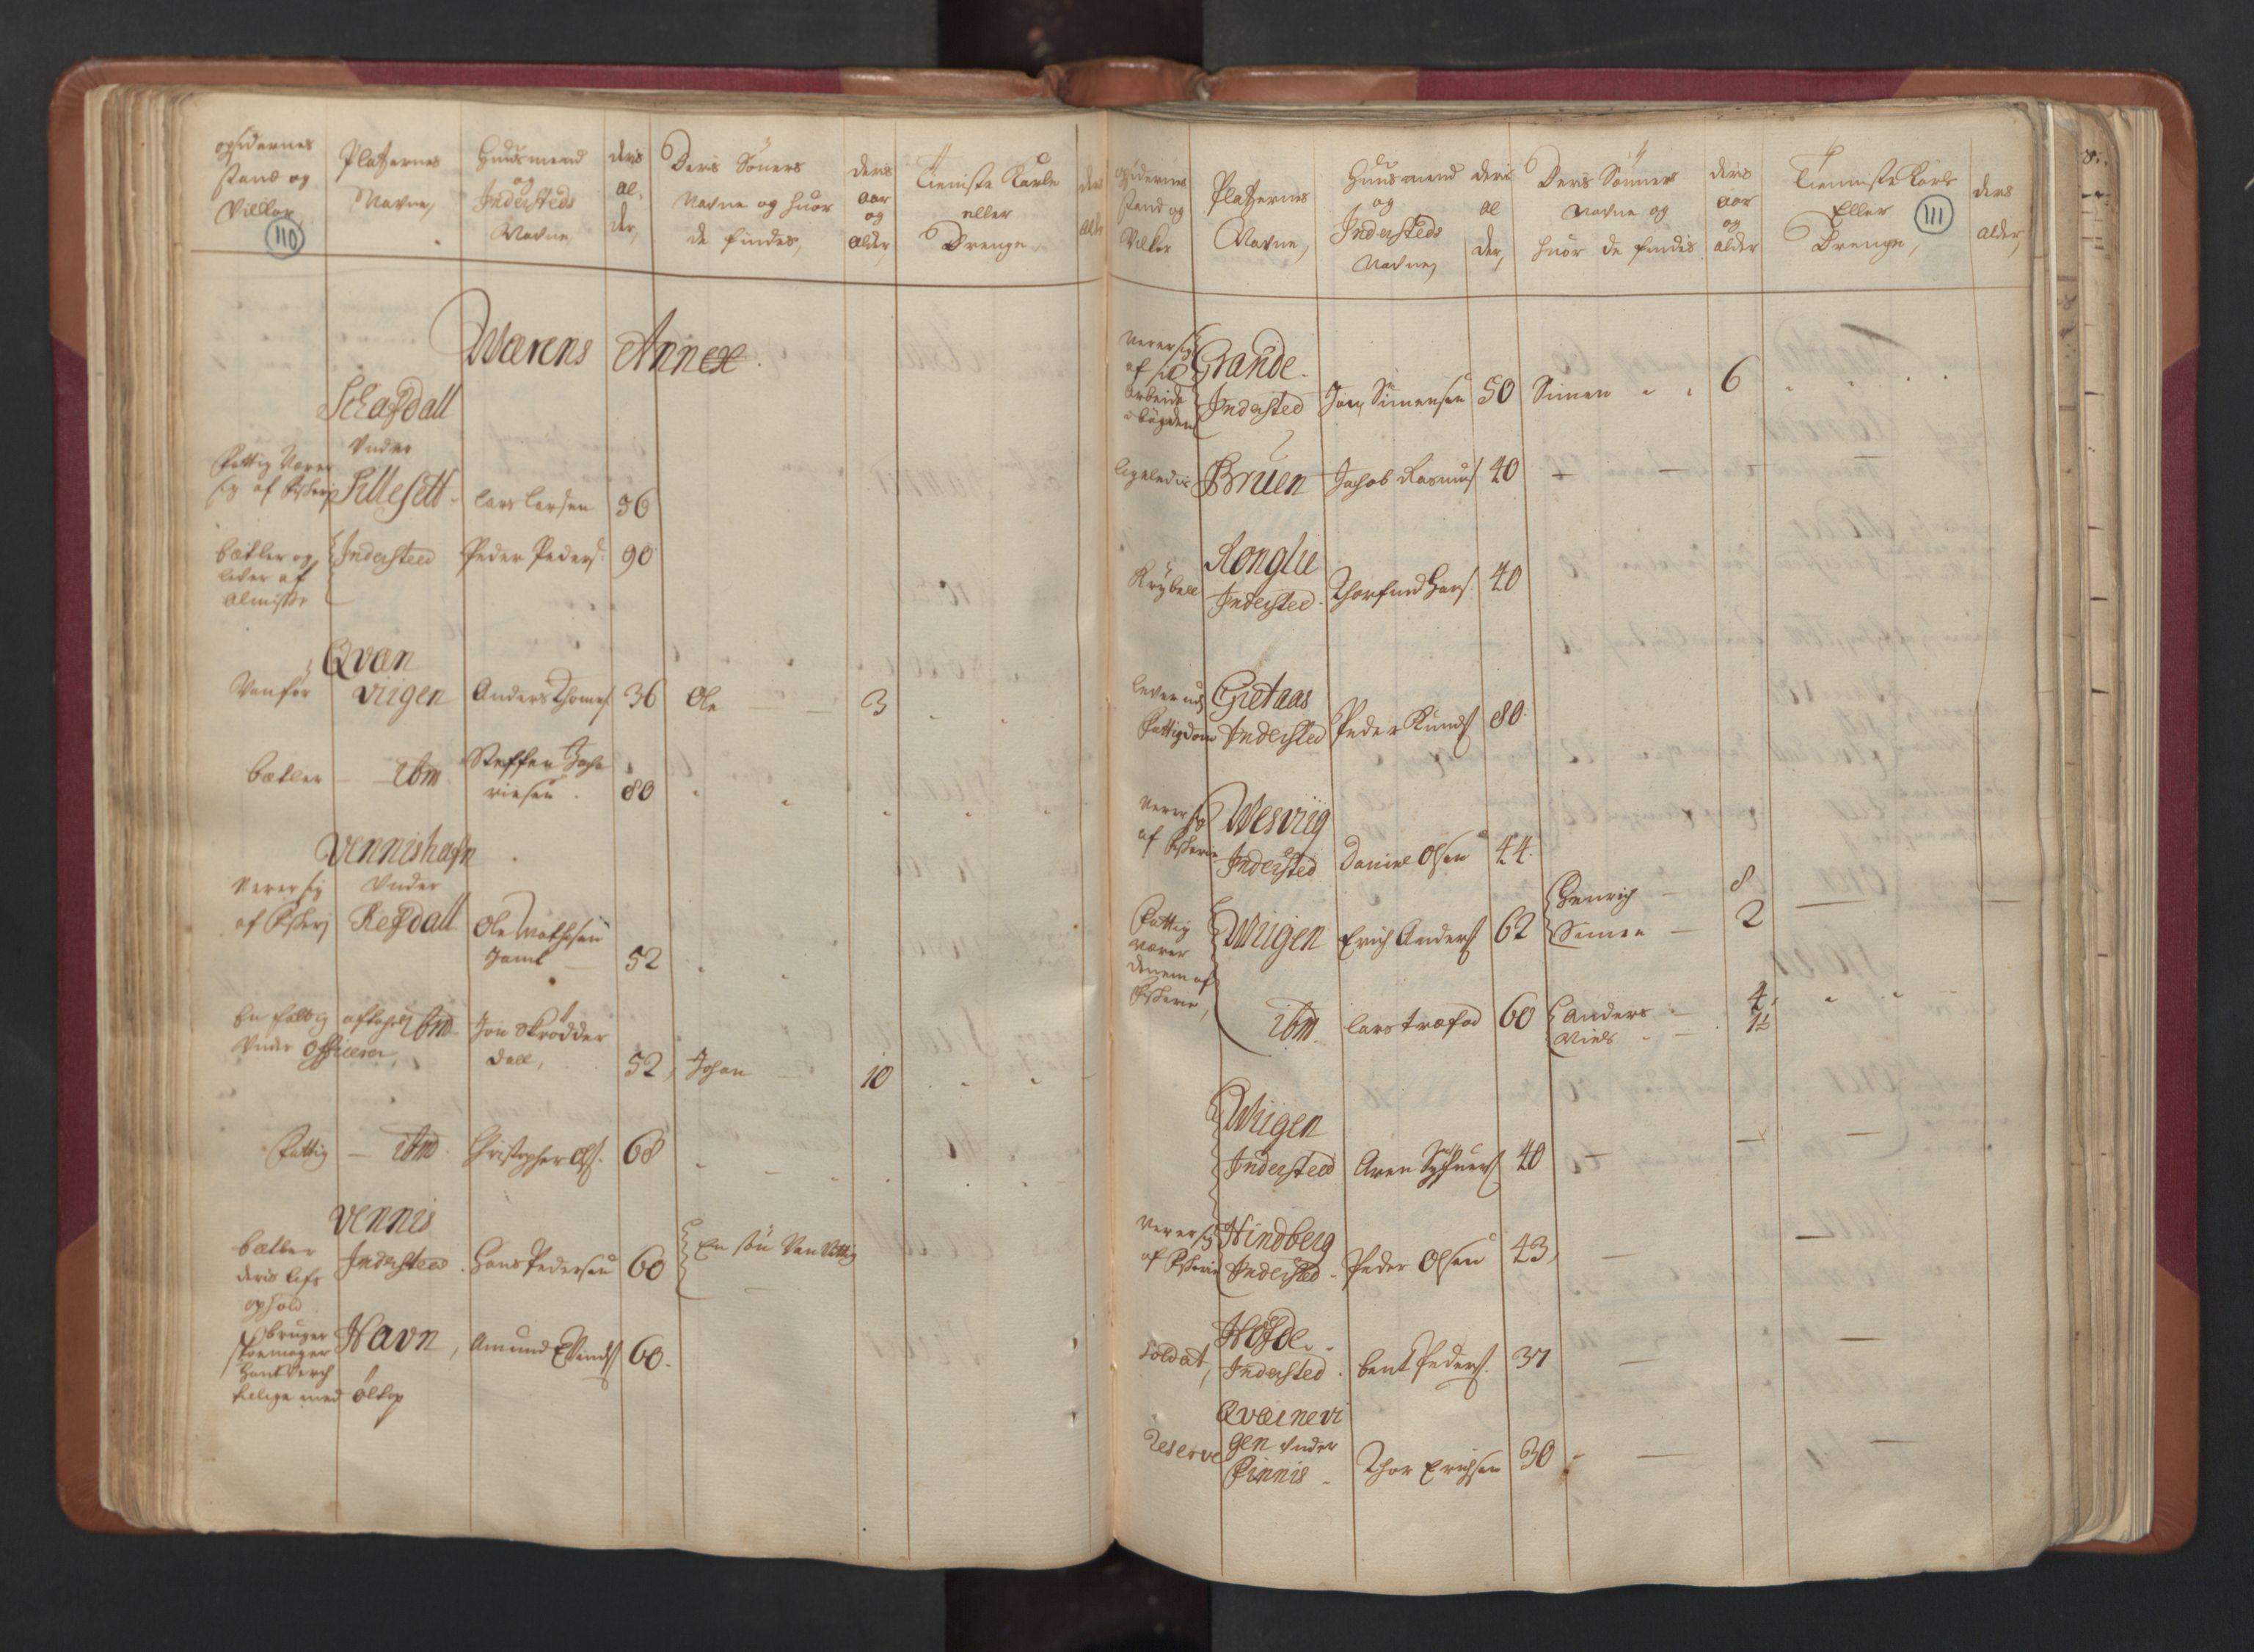 RA, Manntallet 1701, nr. 15: Inderøy fogderi og Namdal fogderi, 1701, s. 110-111